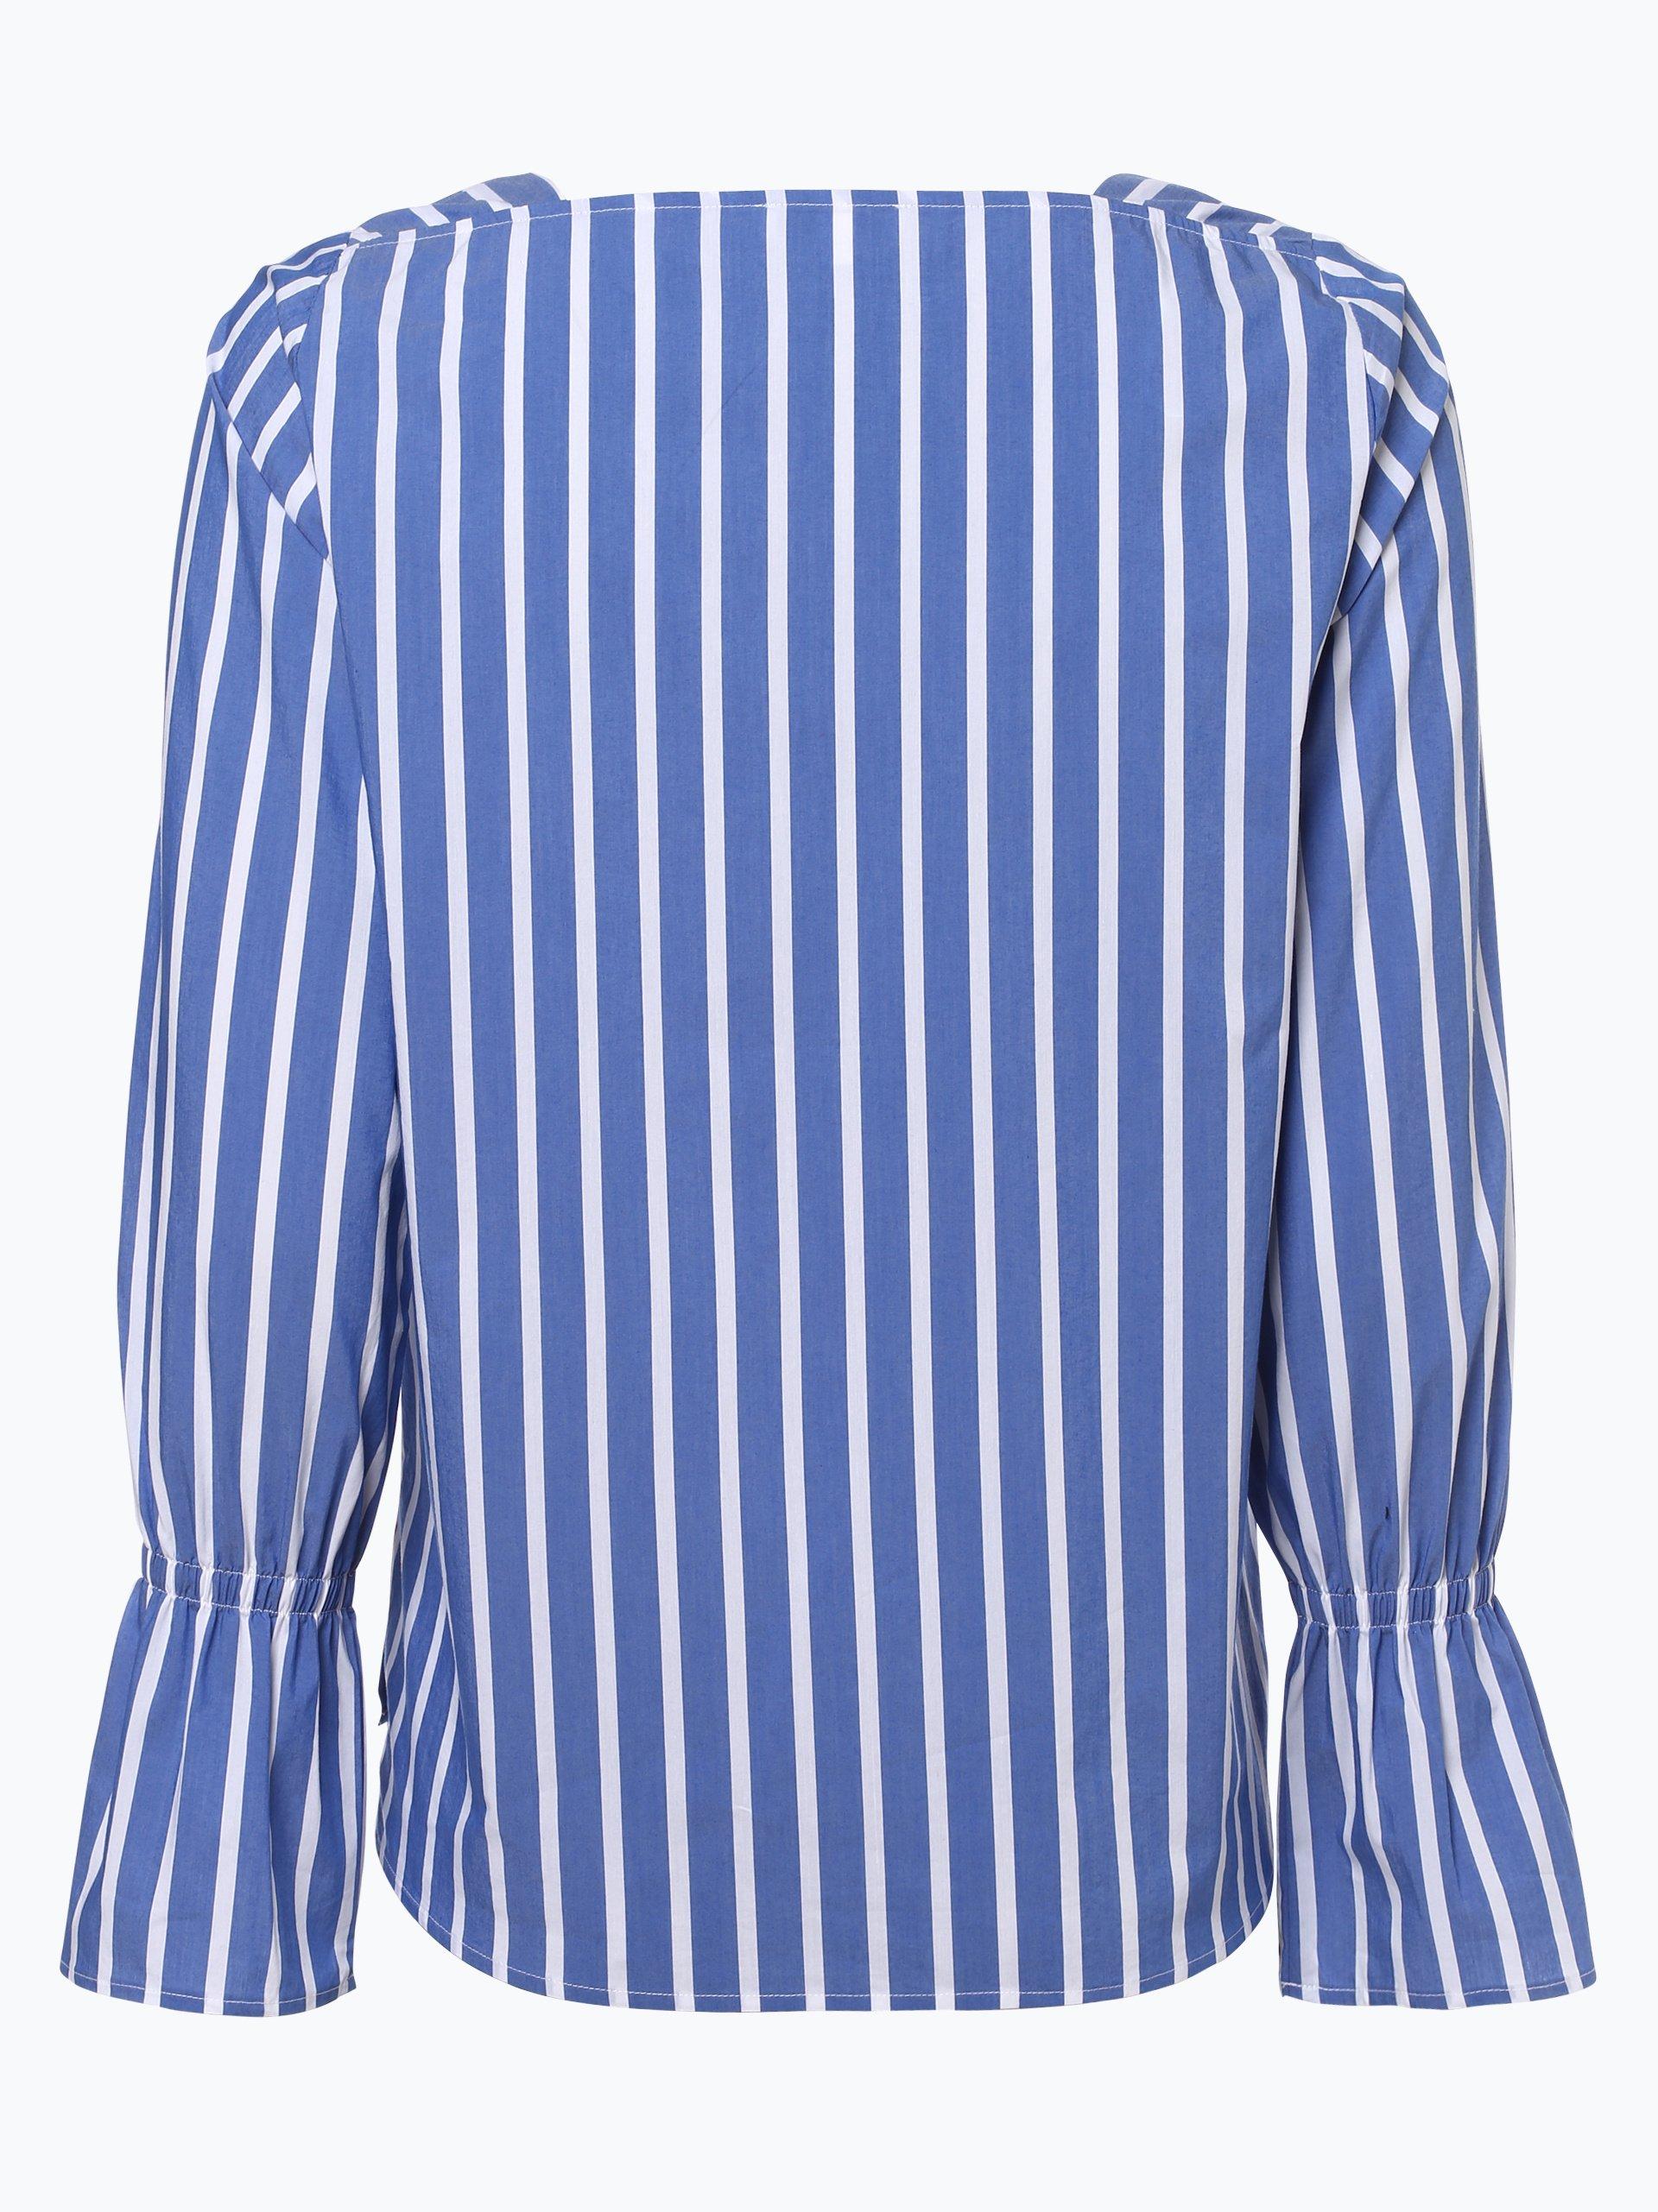 marie lund damen bluse blau gestreift online kaufen vangraaf com. Black Bedroom Furniture Sets. Home Design Ideas